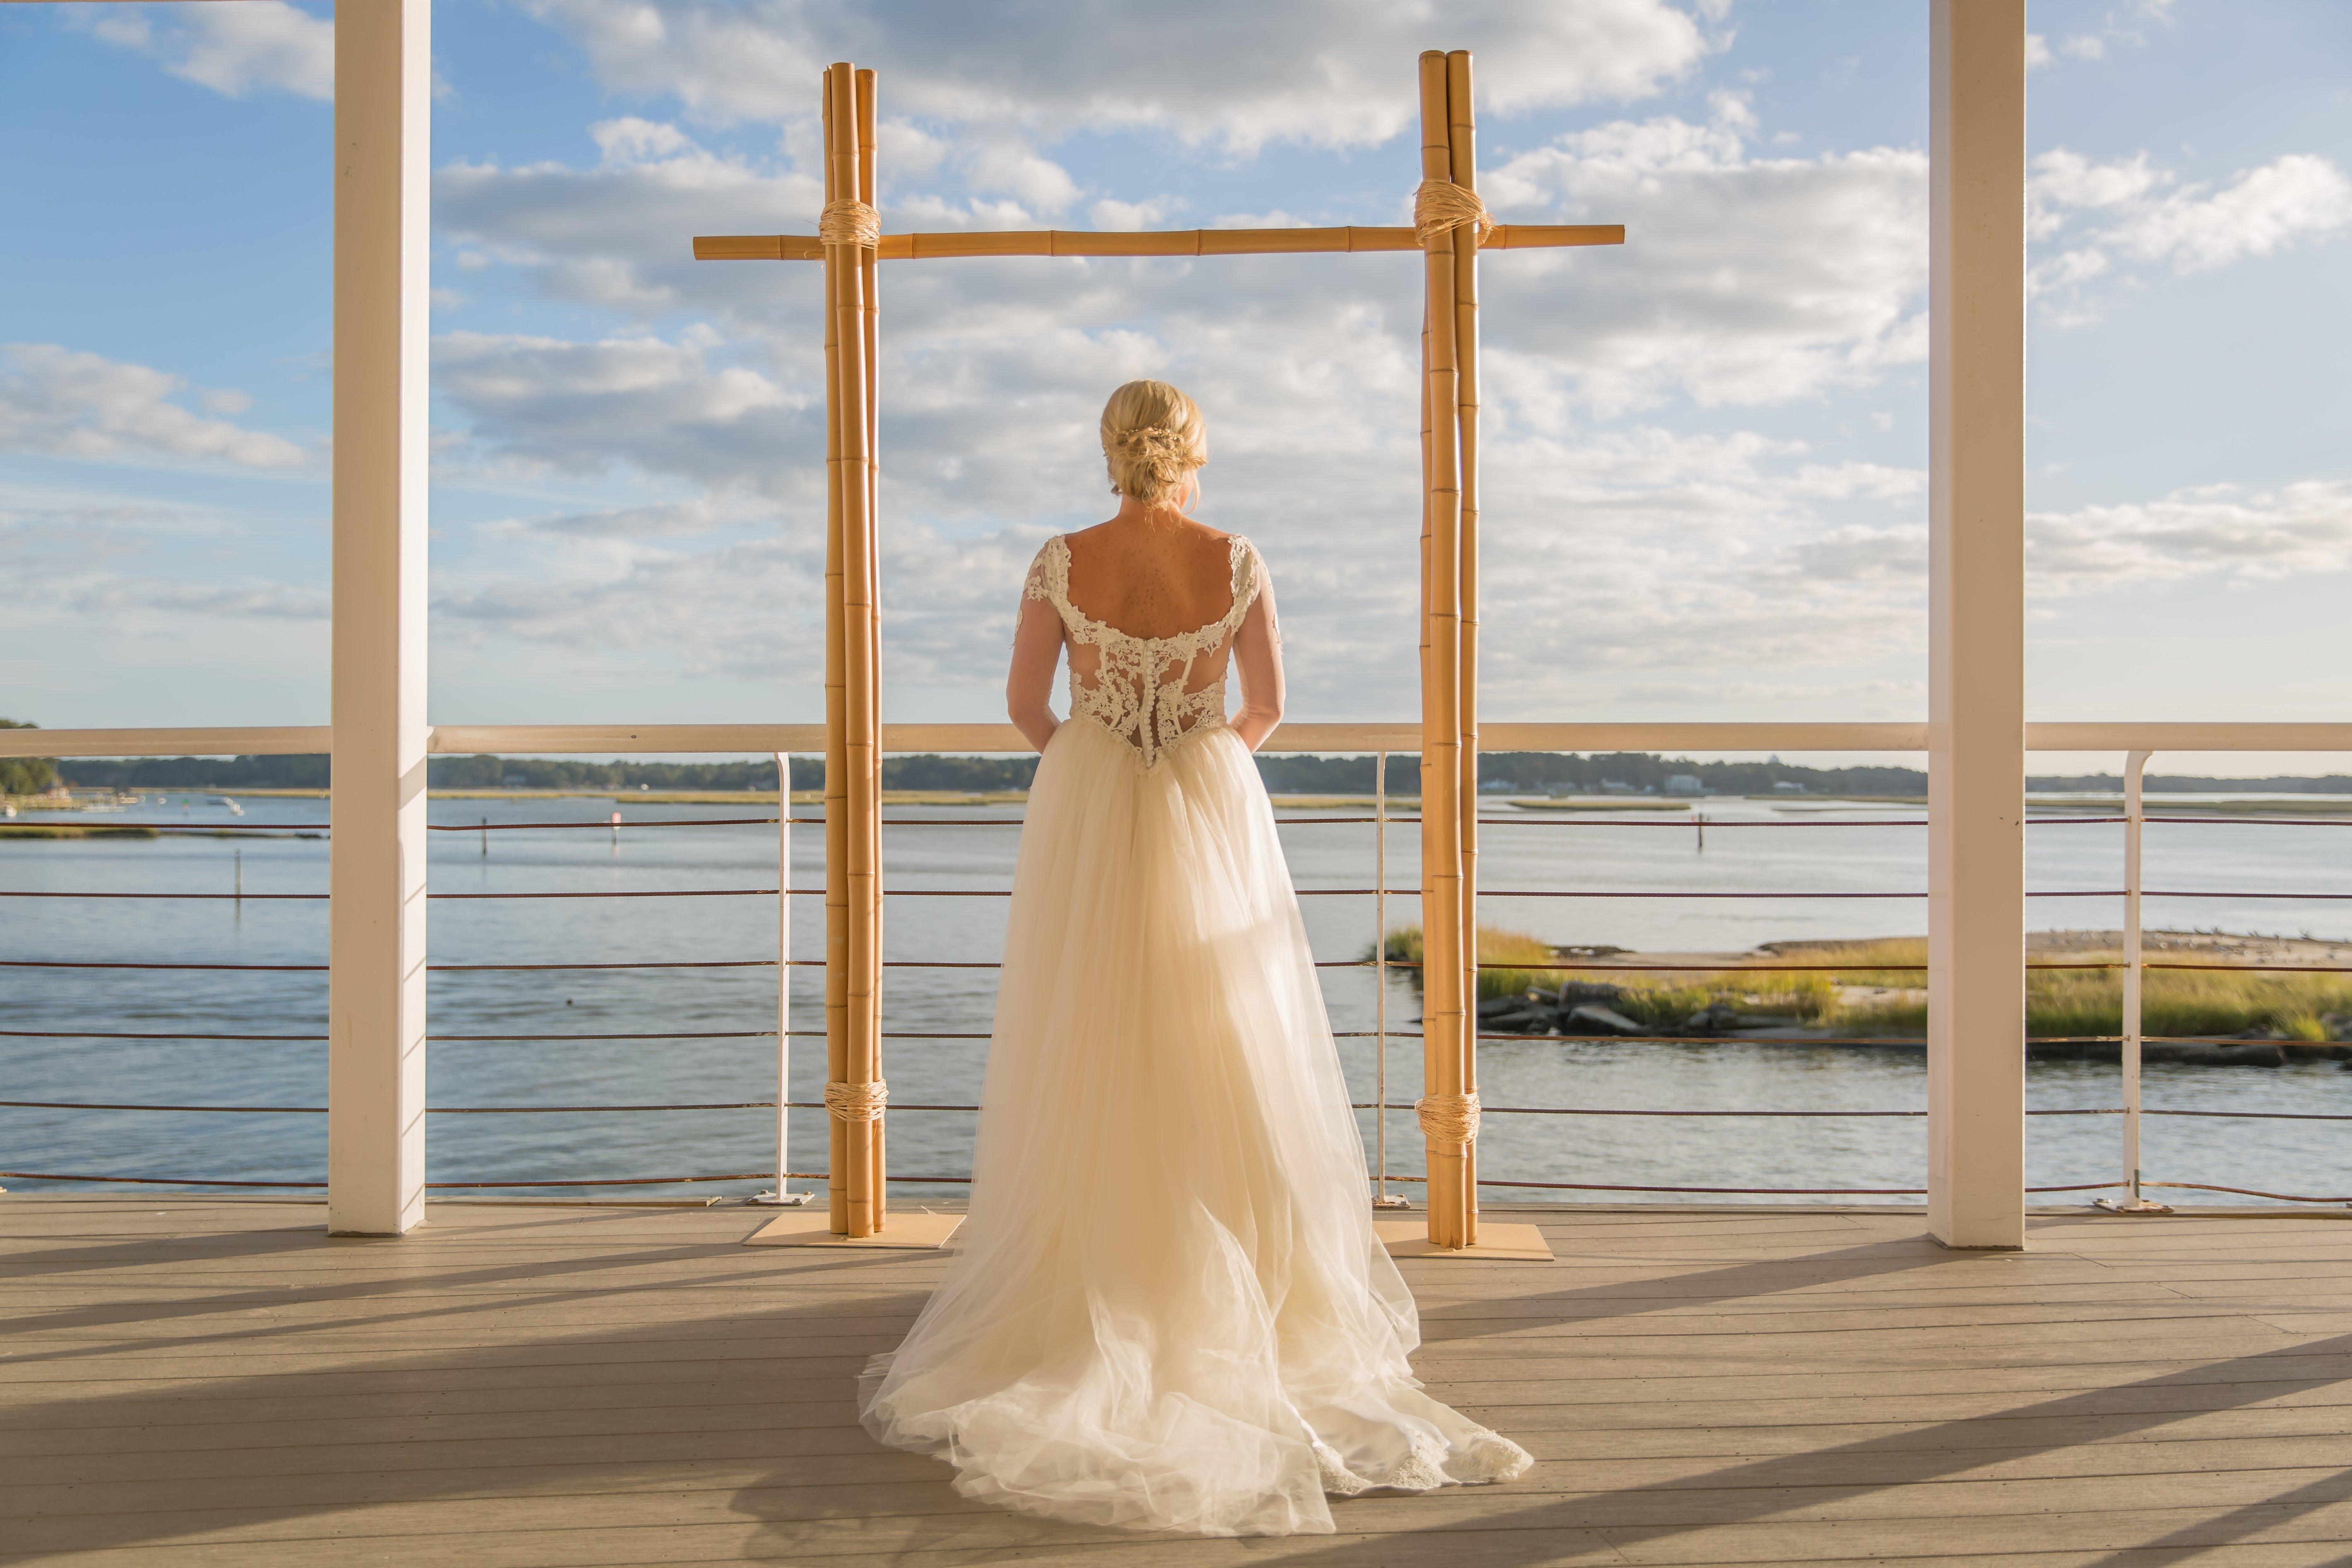 Best-Something-Old-Refurbrished-Wedding-Dress-Love-Simply-Photography.jpg